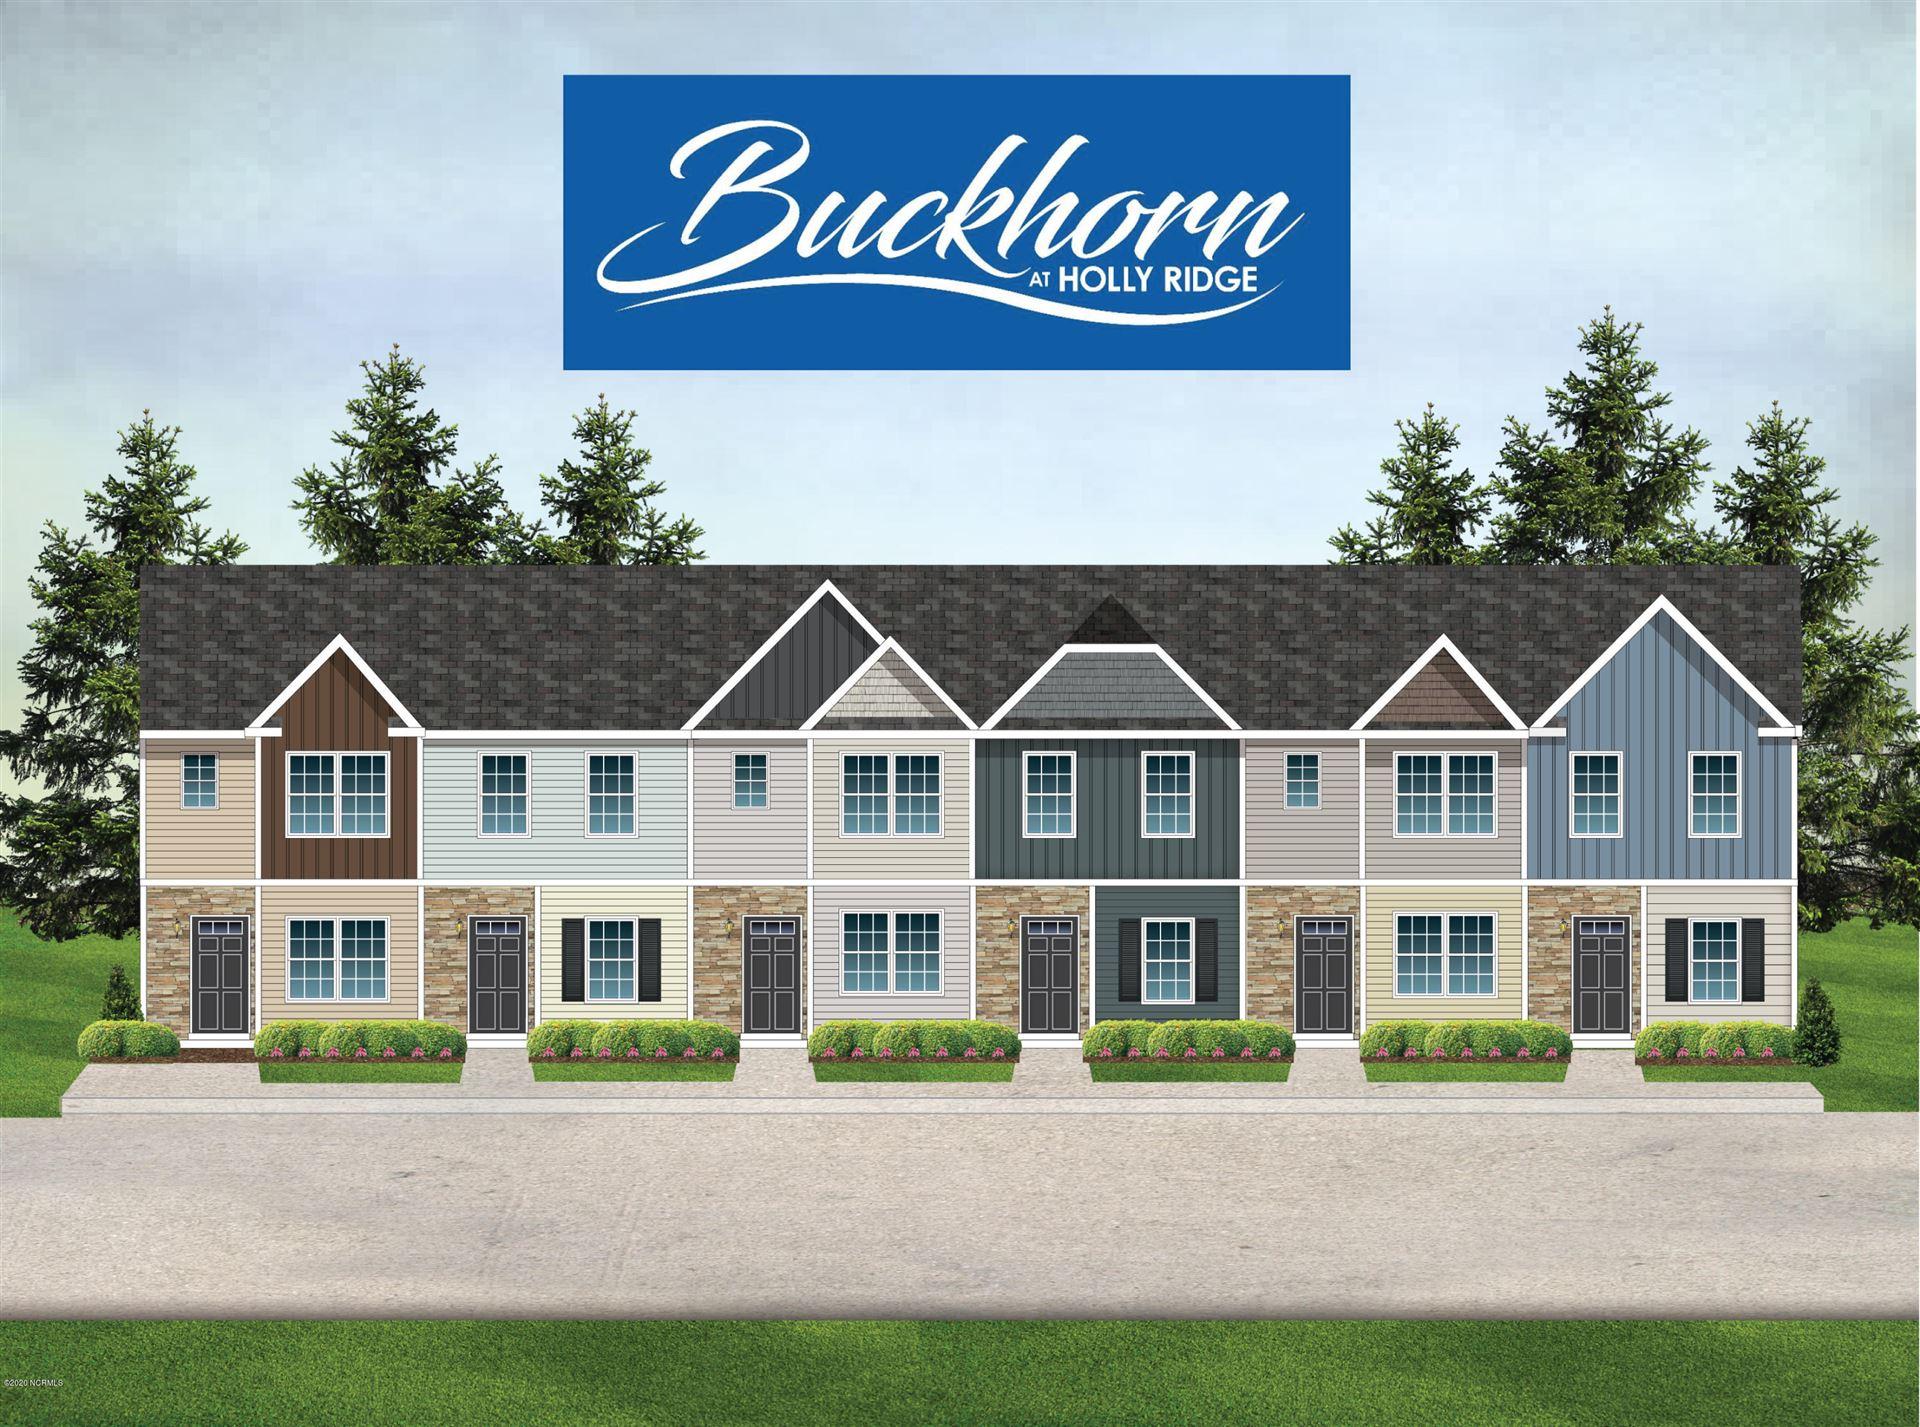 Photo for 132 Buckhorn Avenue, Holly Ridge, NC 28445 (MLS # 100224895)